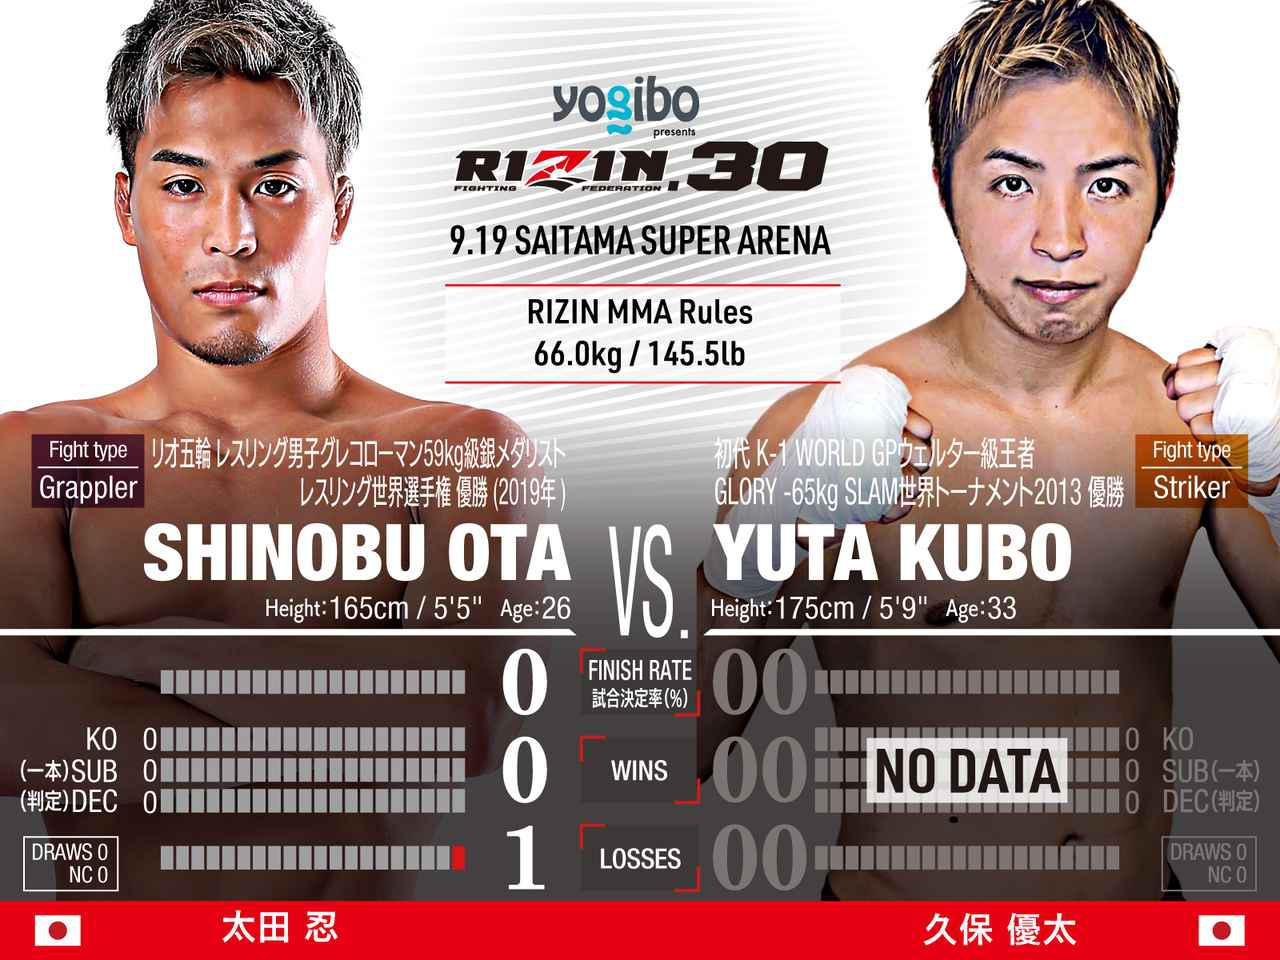 画像: Shinobu Ota vs Yuta Kubo